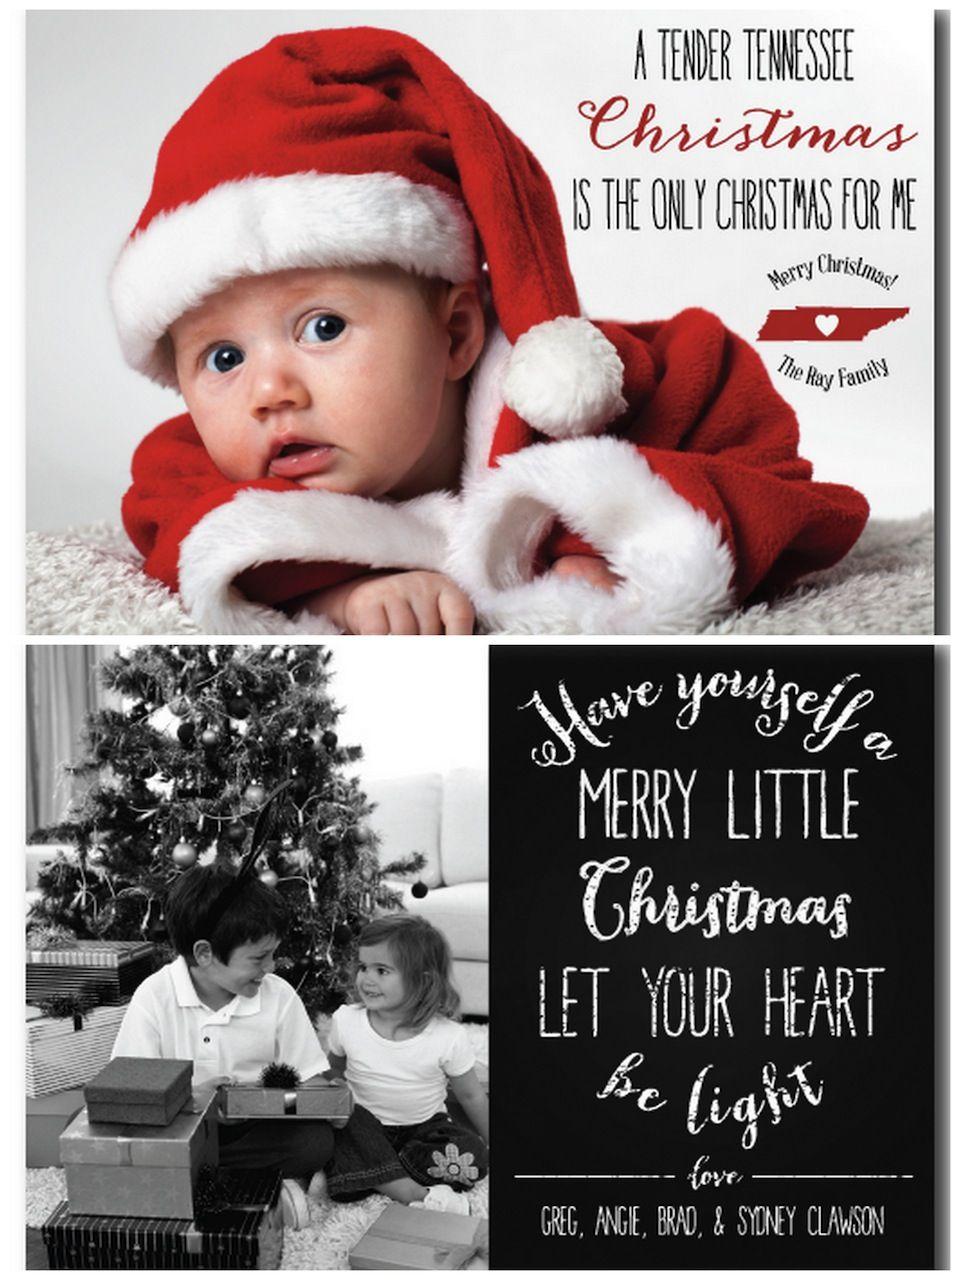 2014 Holiday Cards Sneak Peak! #w101nashville #nashvillepapervendors #holidaycards #darbycards